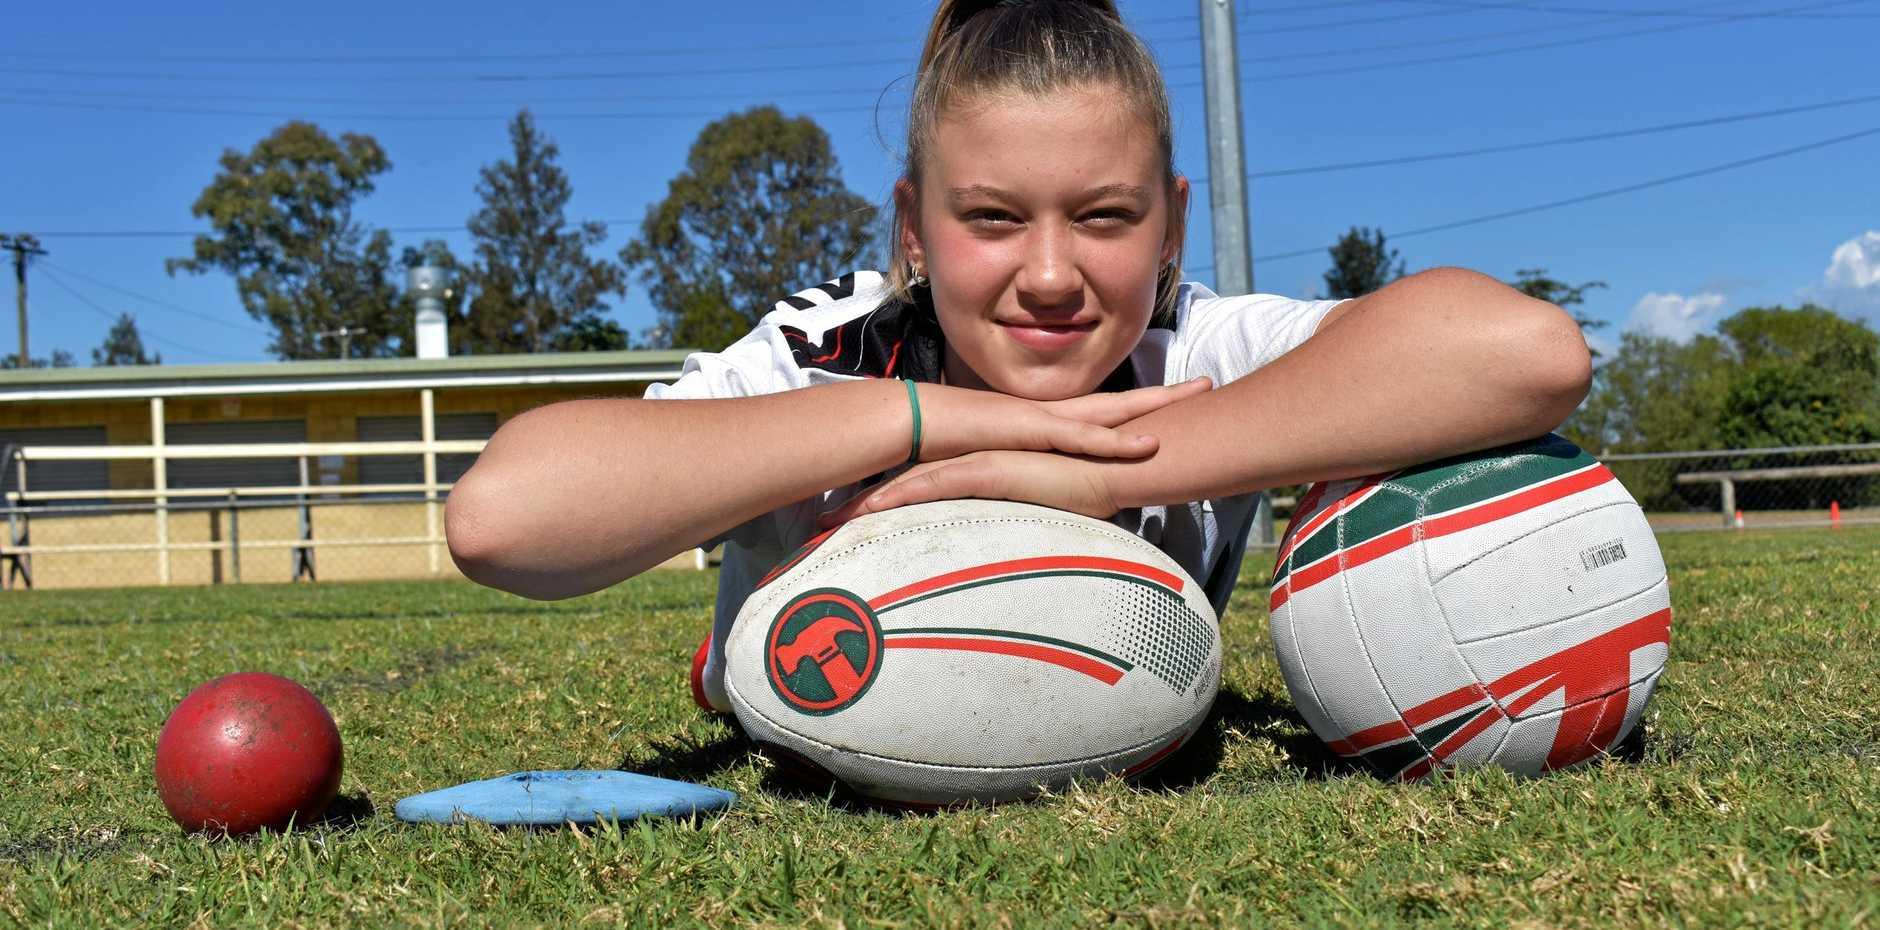 BIG DREAMS: Gympie athlete Makayla Elliott hopes to represent Australia  in any of her three sports.